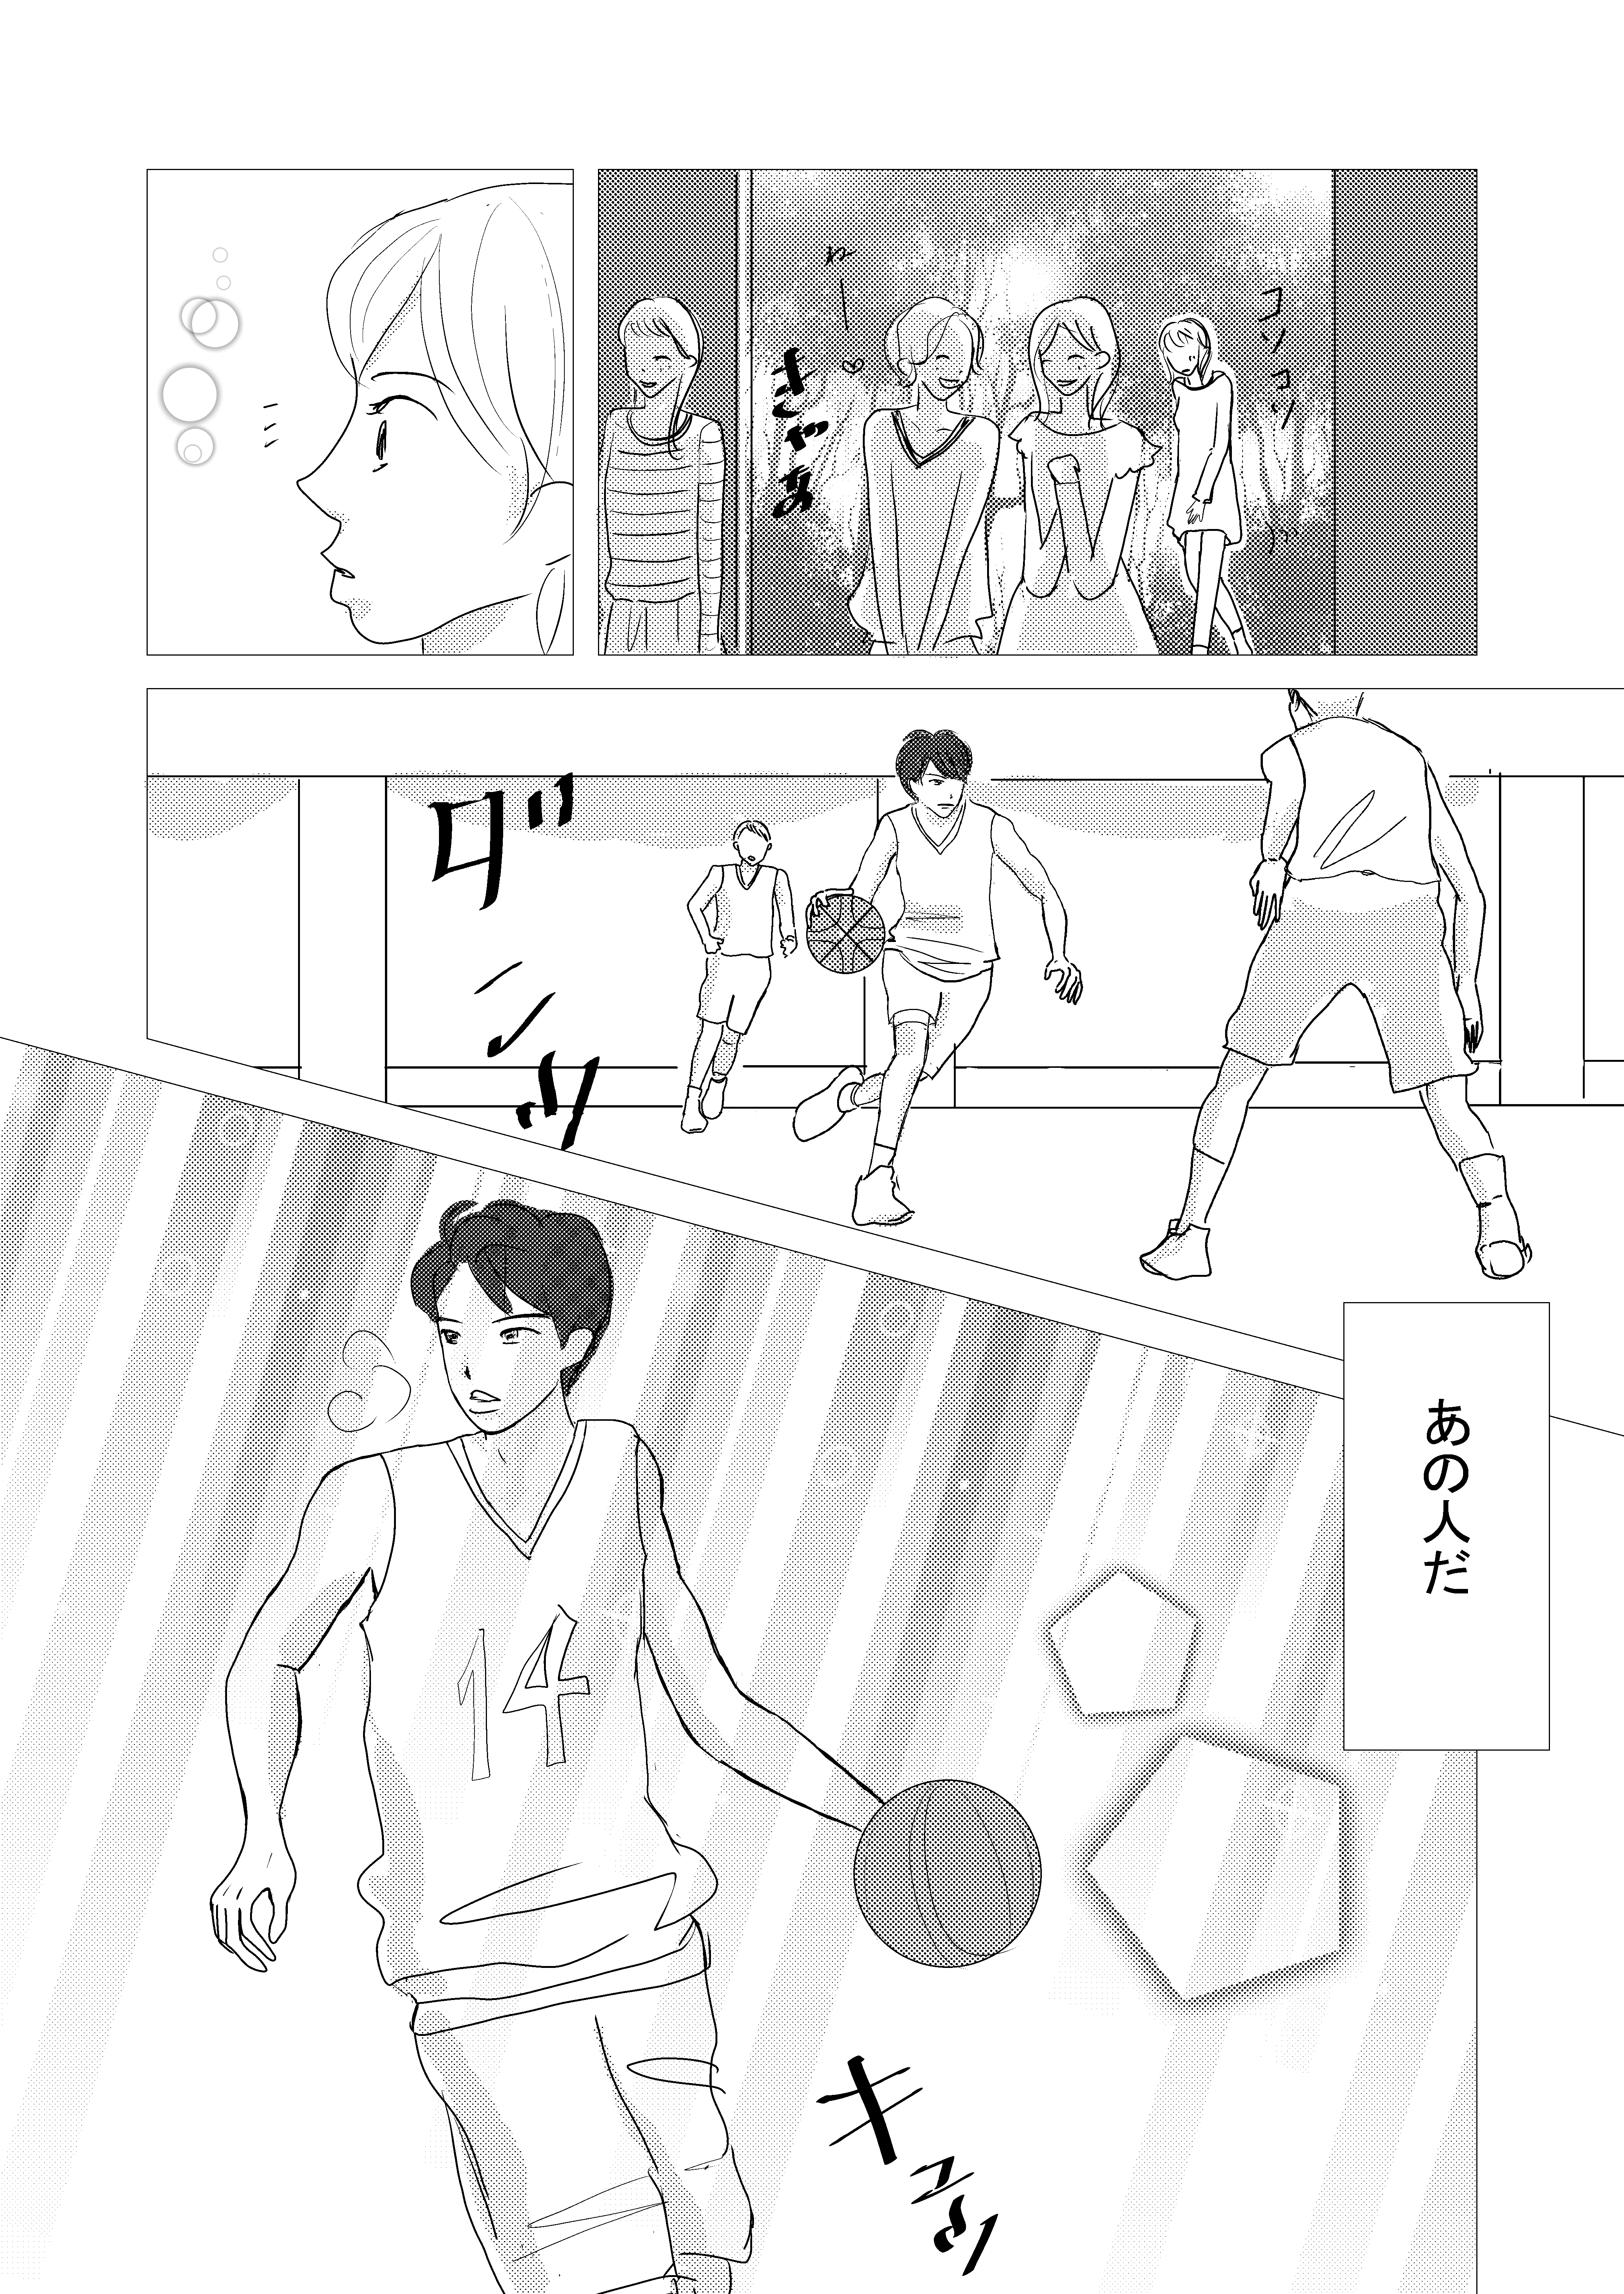 恋愛漫画/大学生/社会人/shoujyo manga/米加夢/17ページ